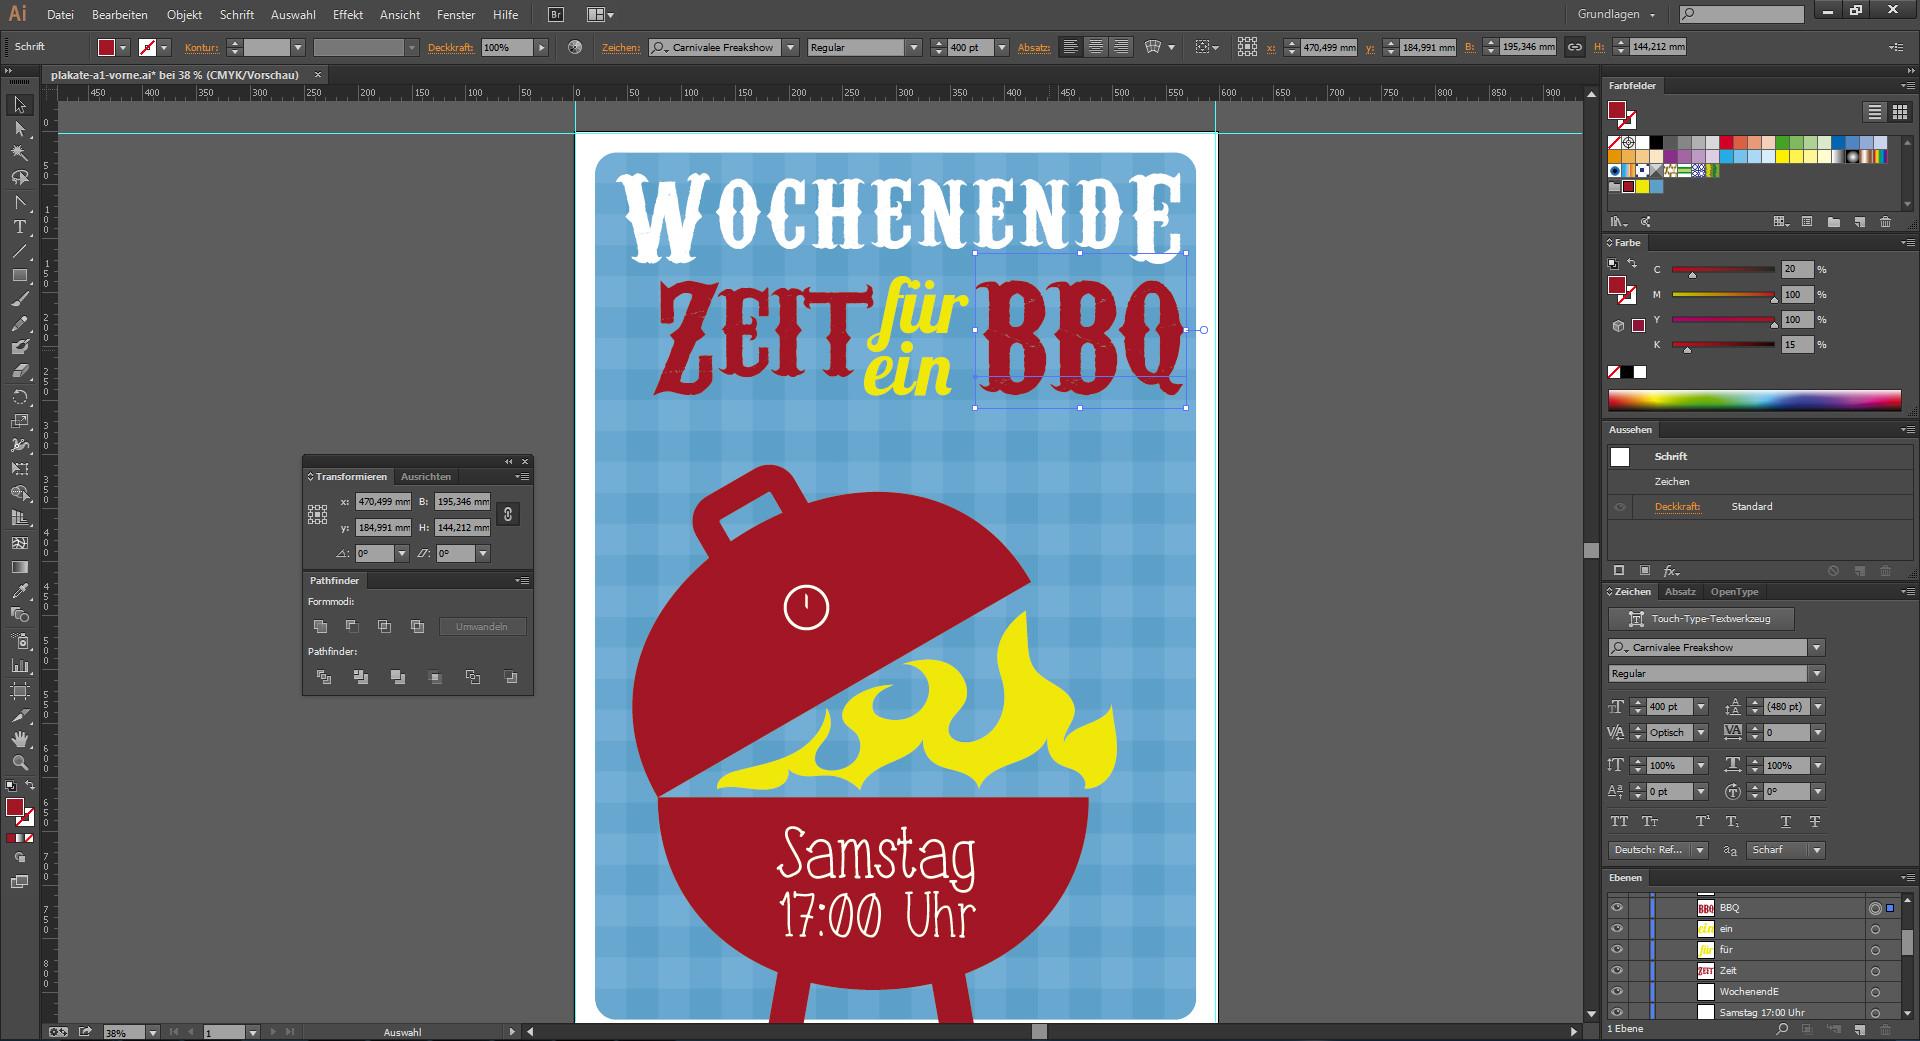 Textbearbeitung im Programm Illustrator